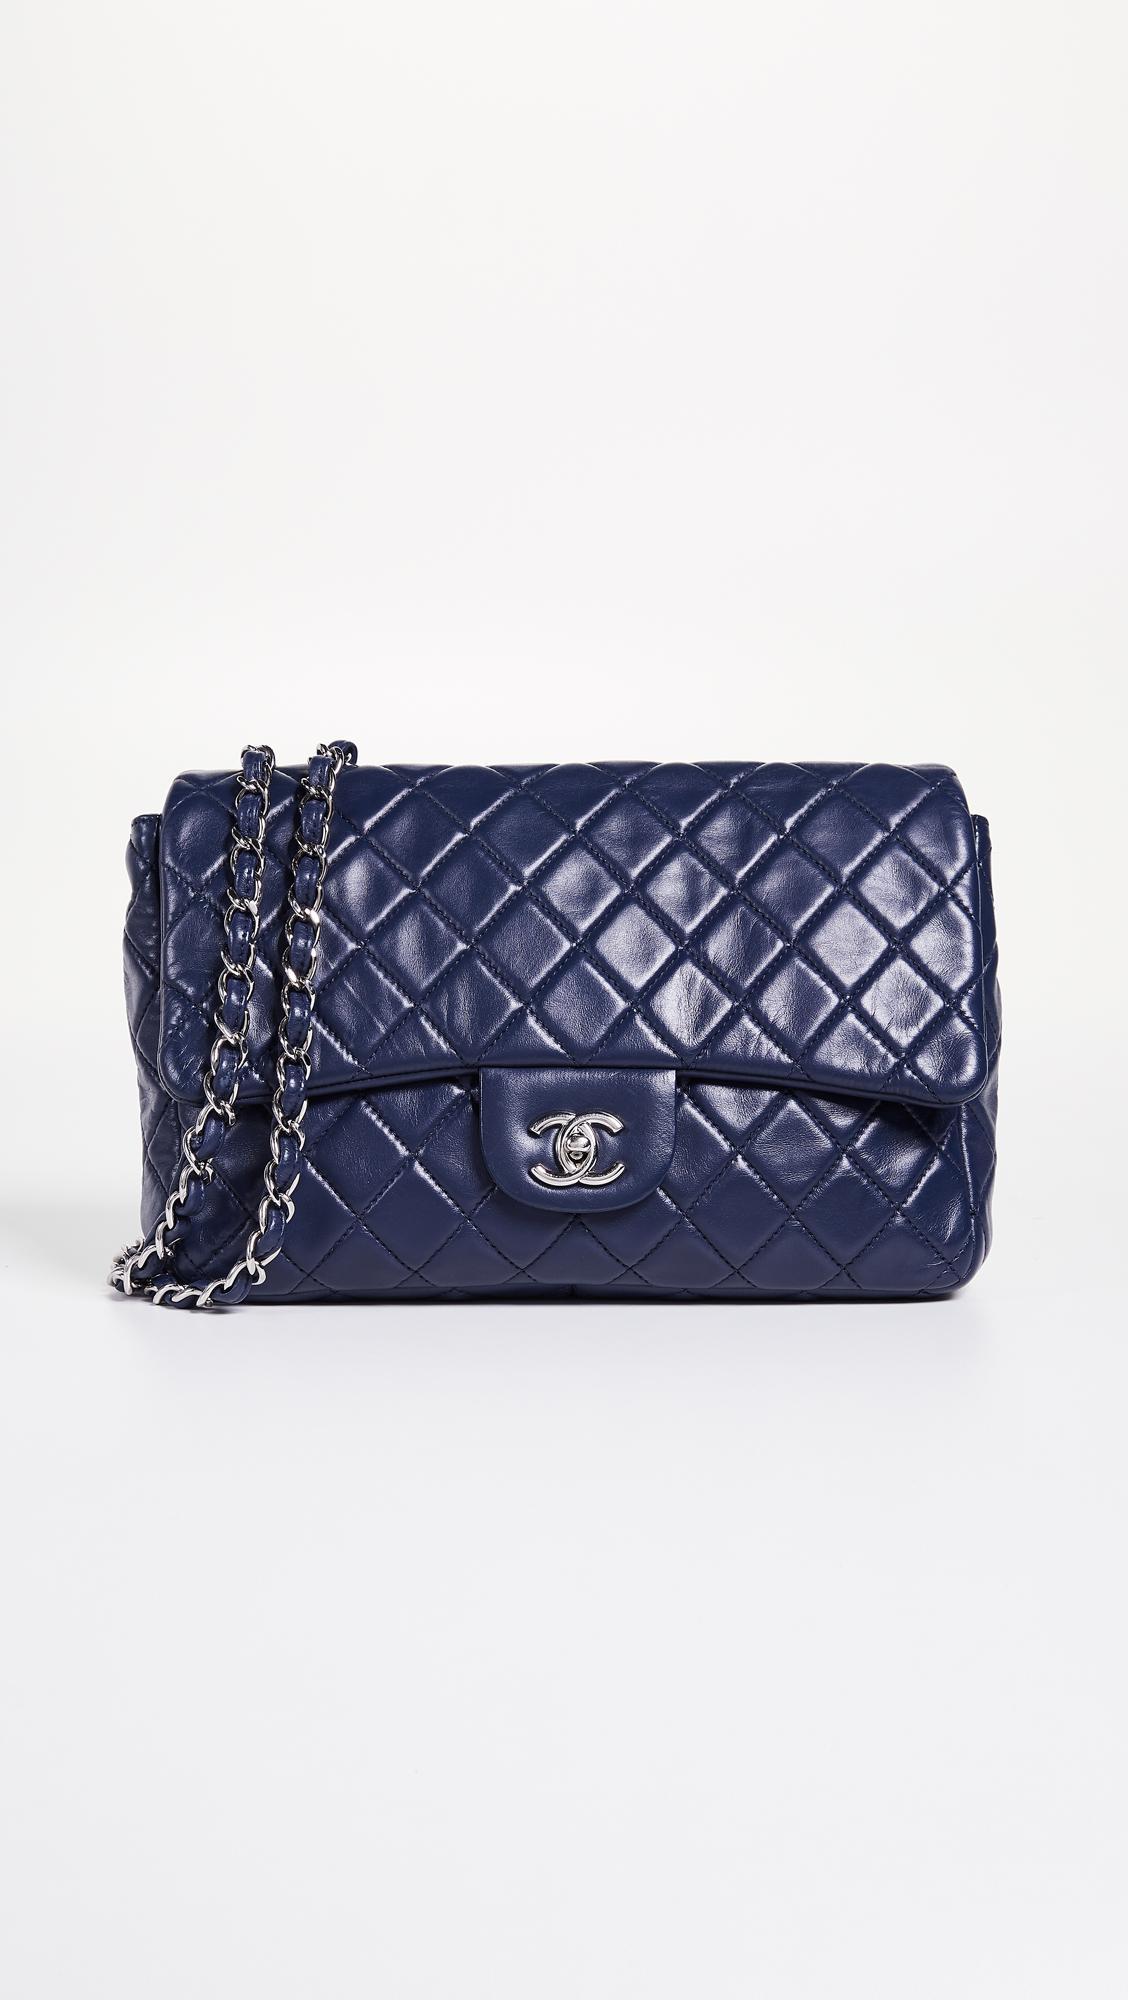 9f696d4cdb00db What Goes Around Comes Around. Women's Chanel Blue Lamb New Classic Jumbo  Bag